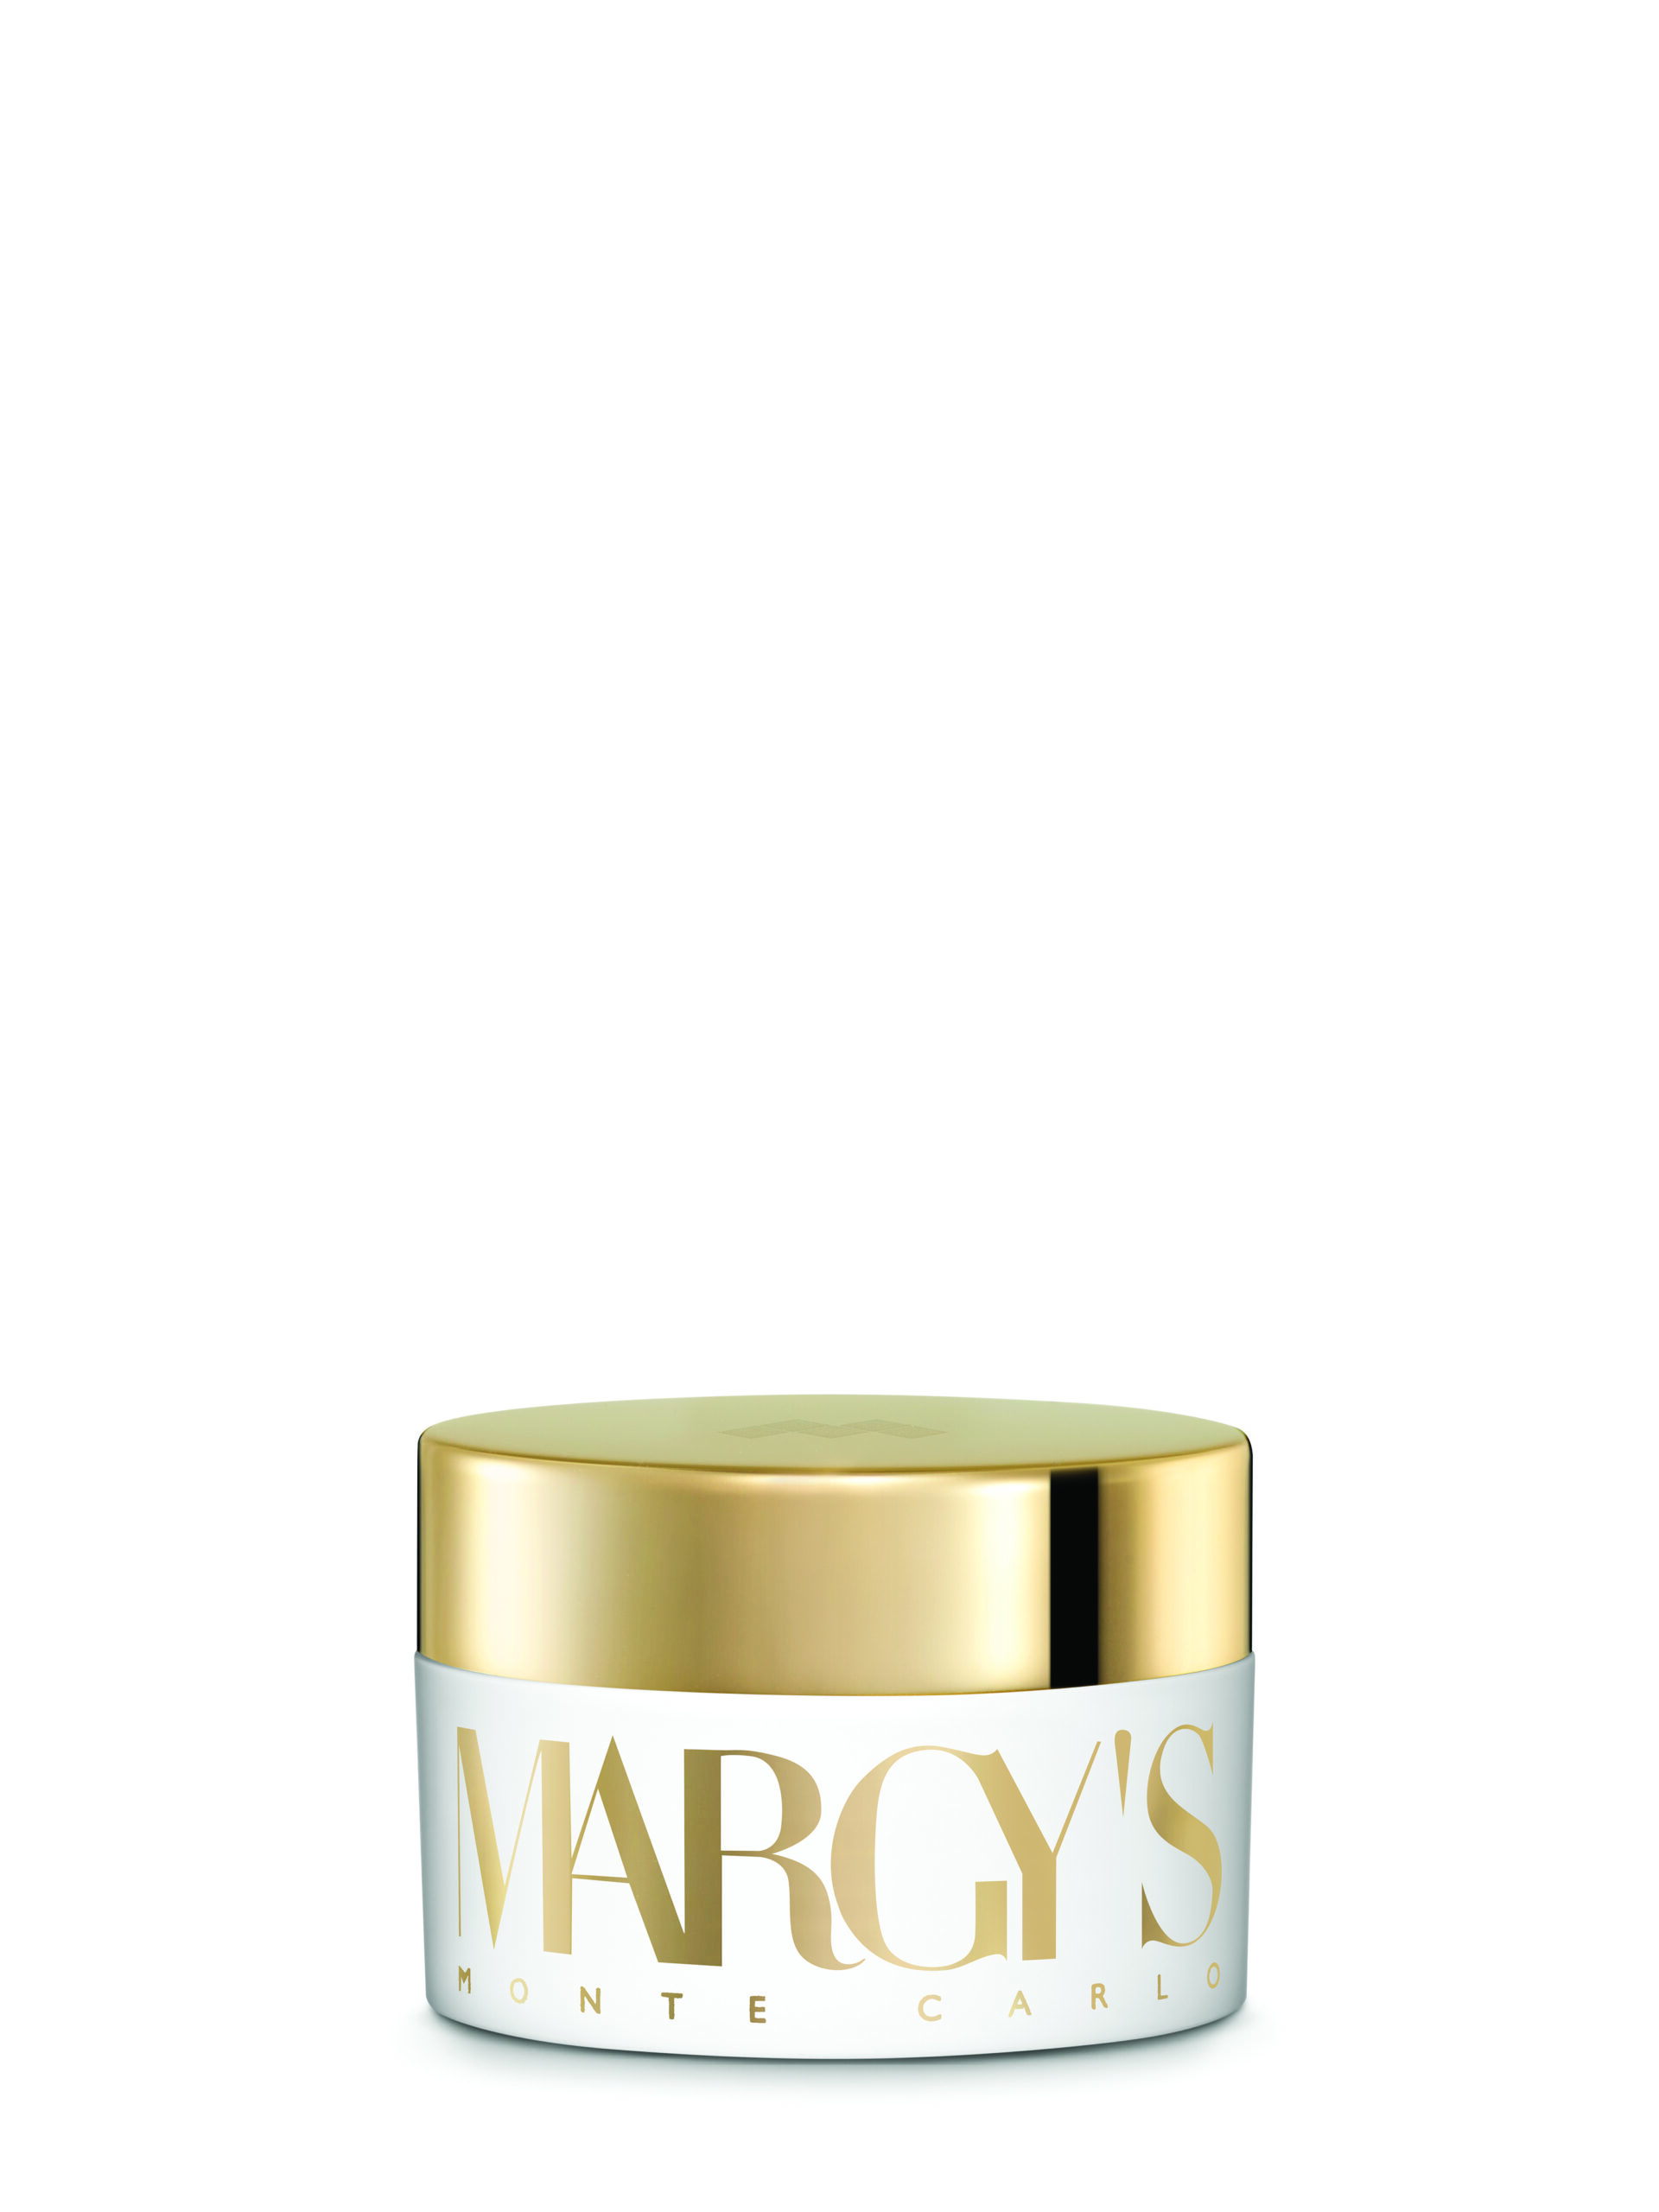 Крем для шеи и декольте Neck and Decollete Cream Margy's Монако 50 мл(р) — фото №1